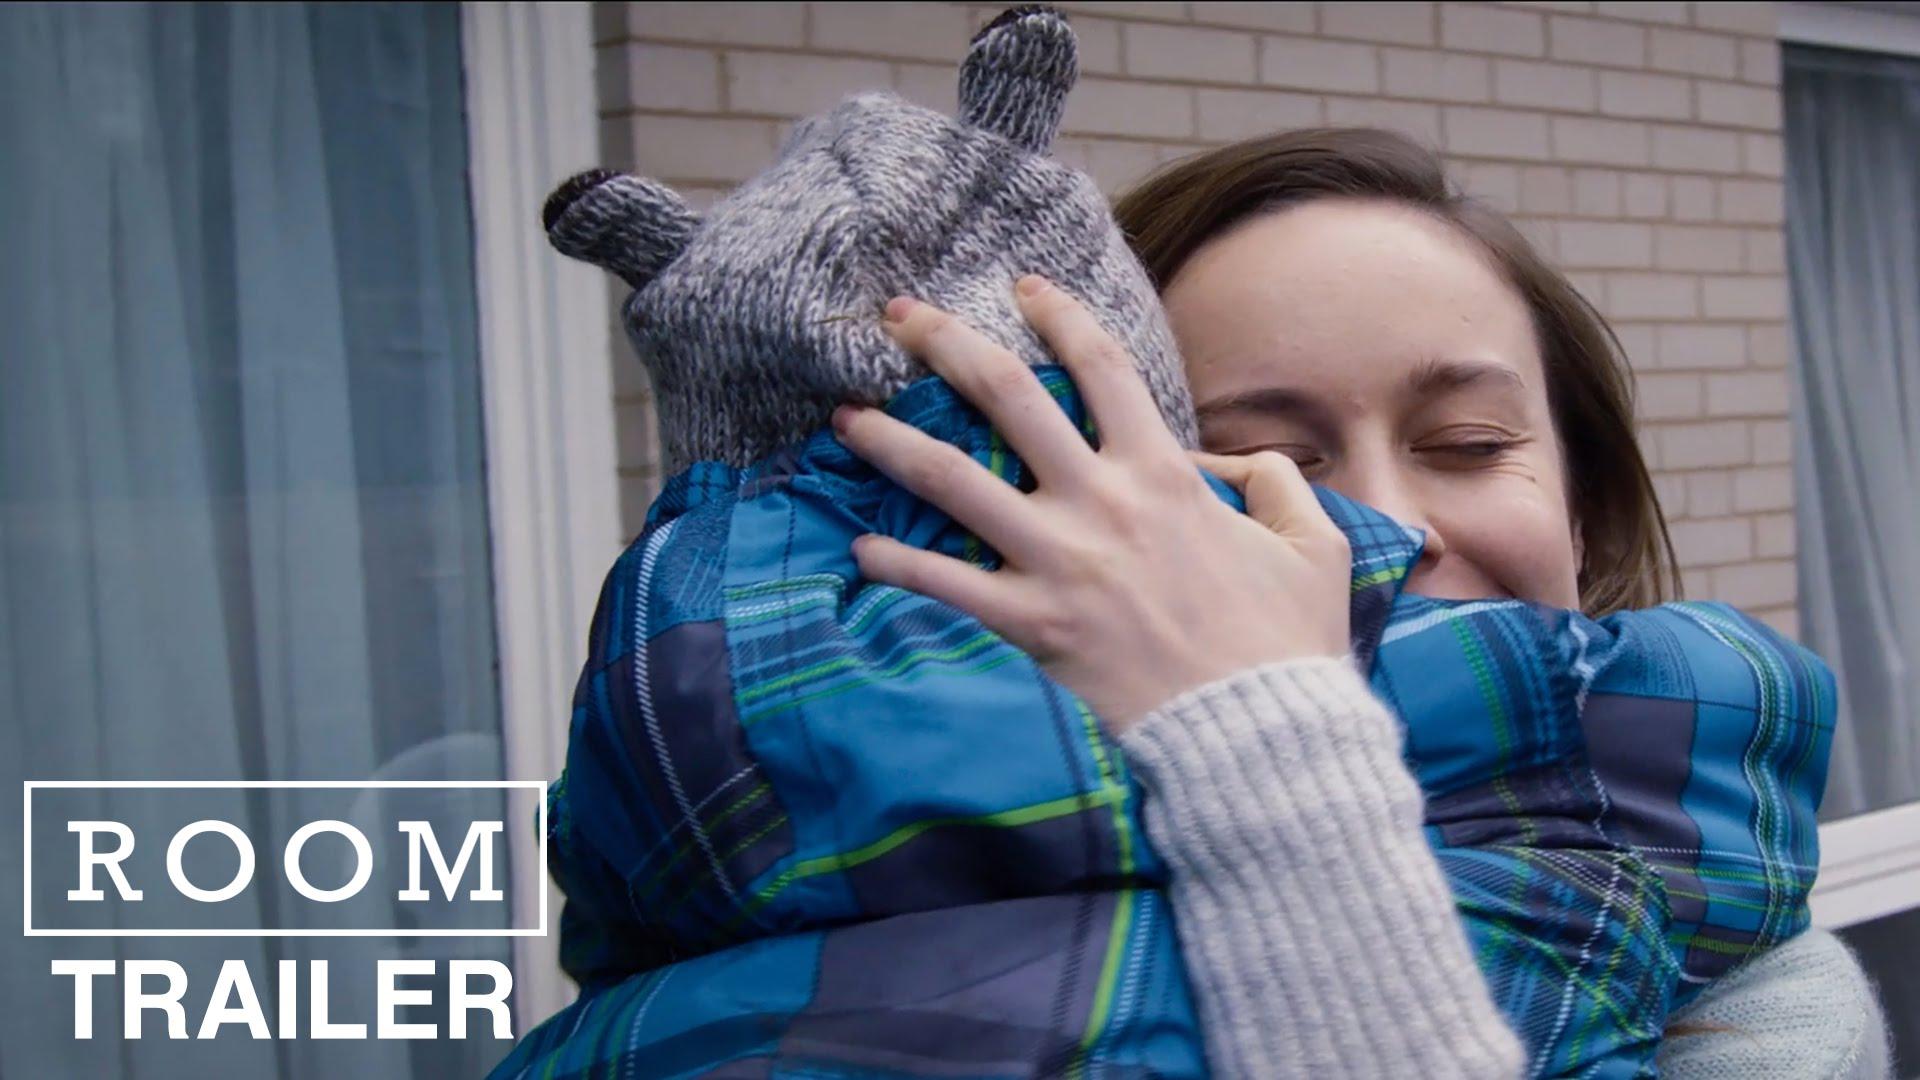 Room (2015) video/trailer